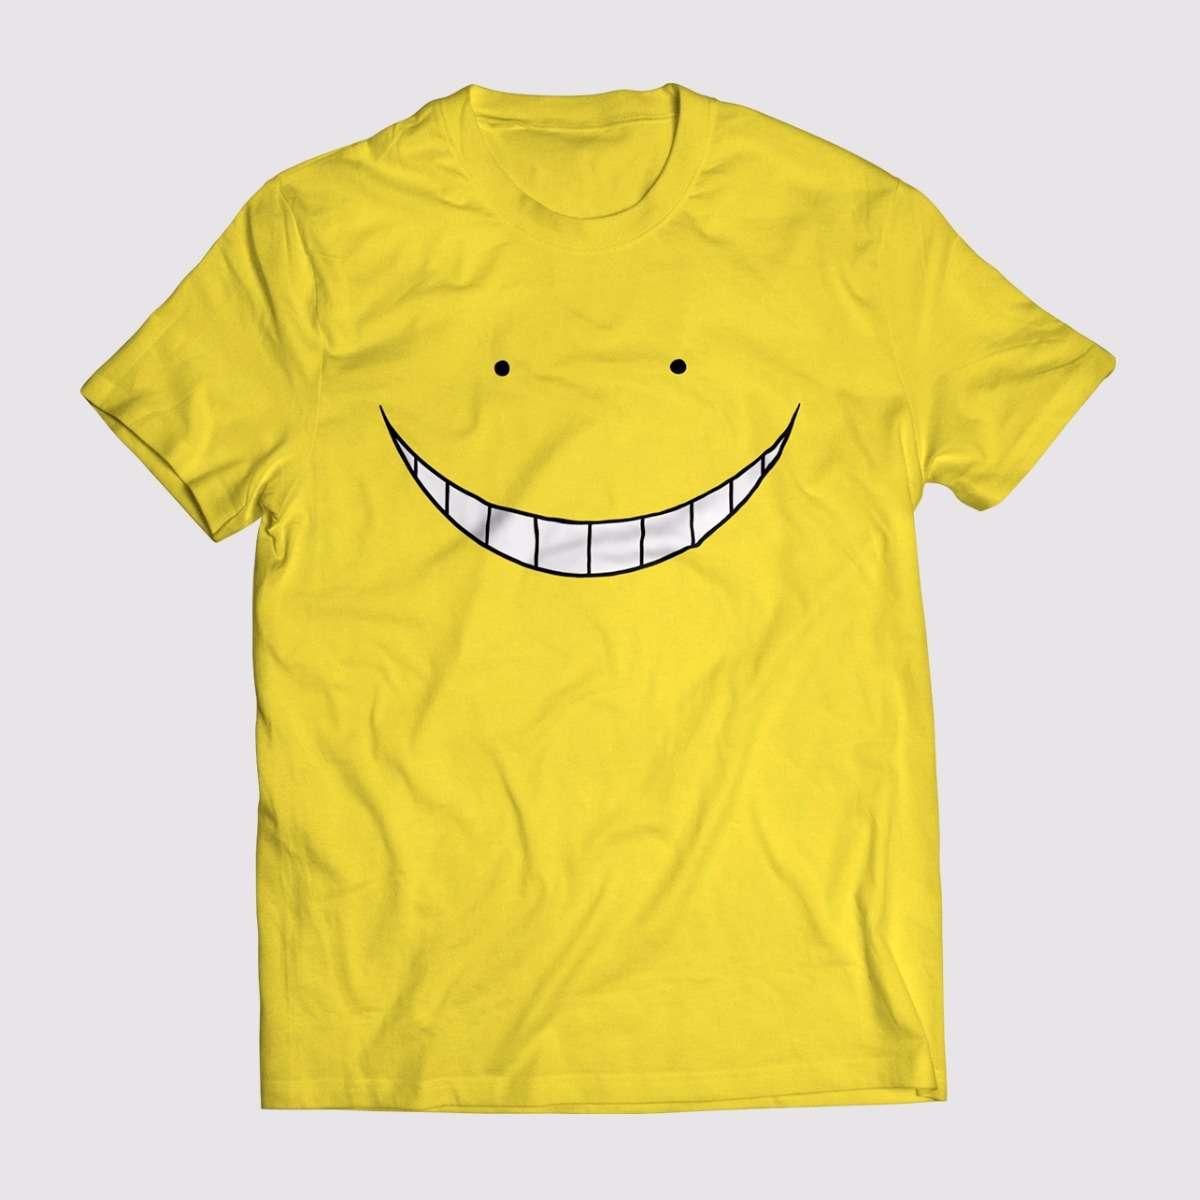 T-Shirt - Koro Sensei apparel